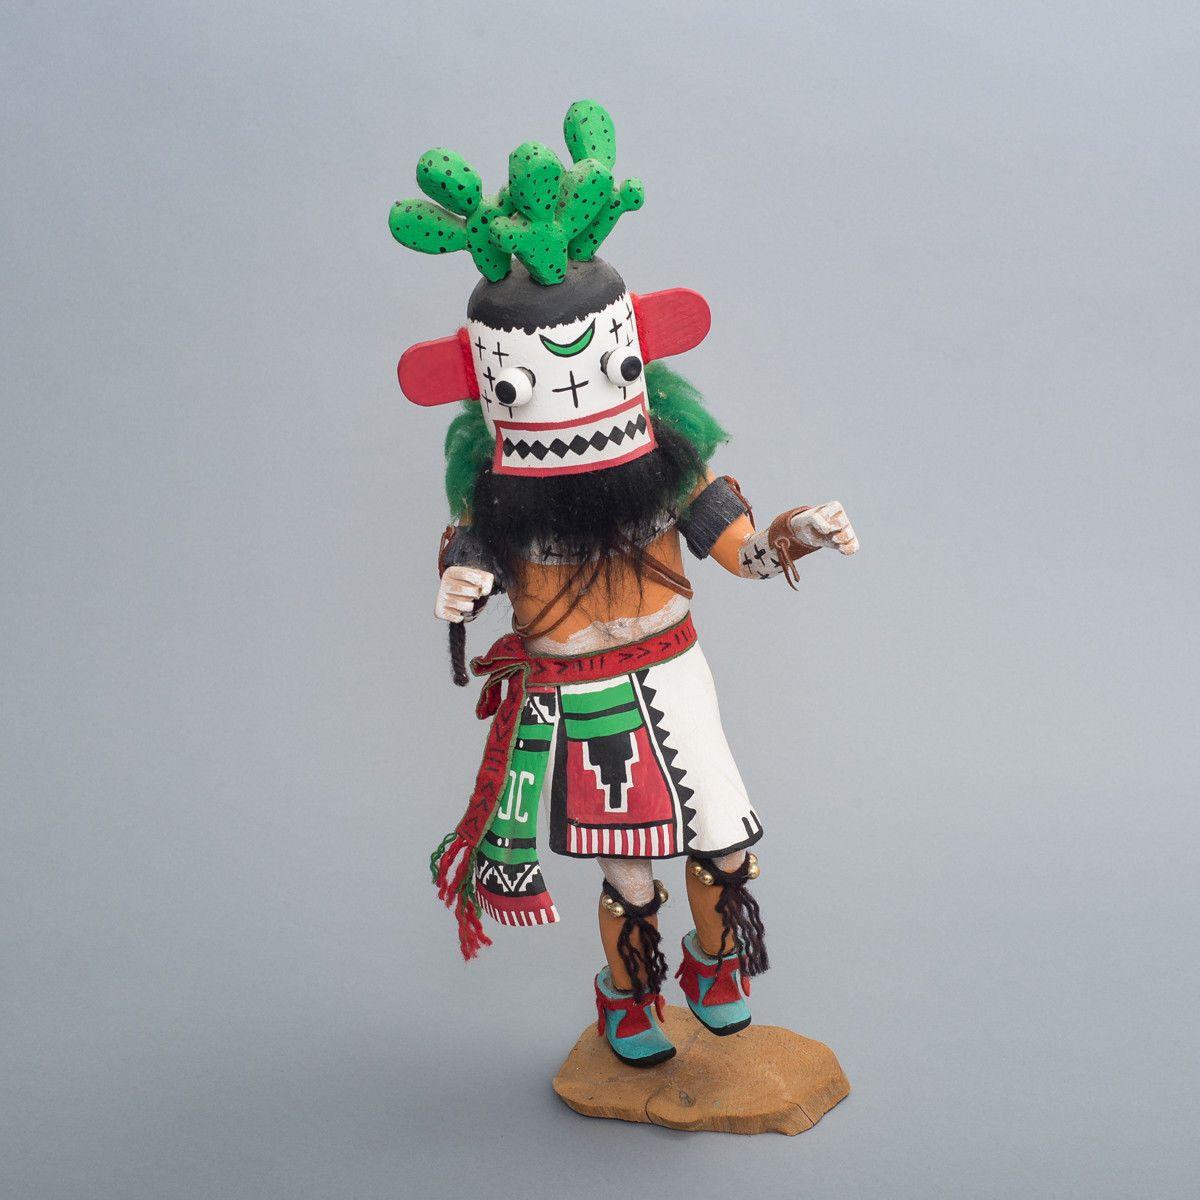 "Large Hopi Cactus Kachina by Toby M. Espinoza of Holbrook Arizona 20.75"" Tall"